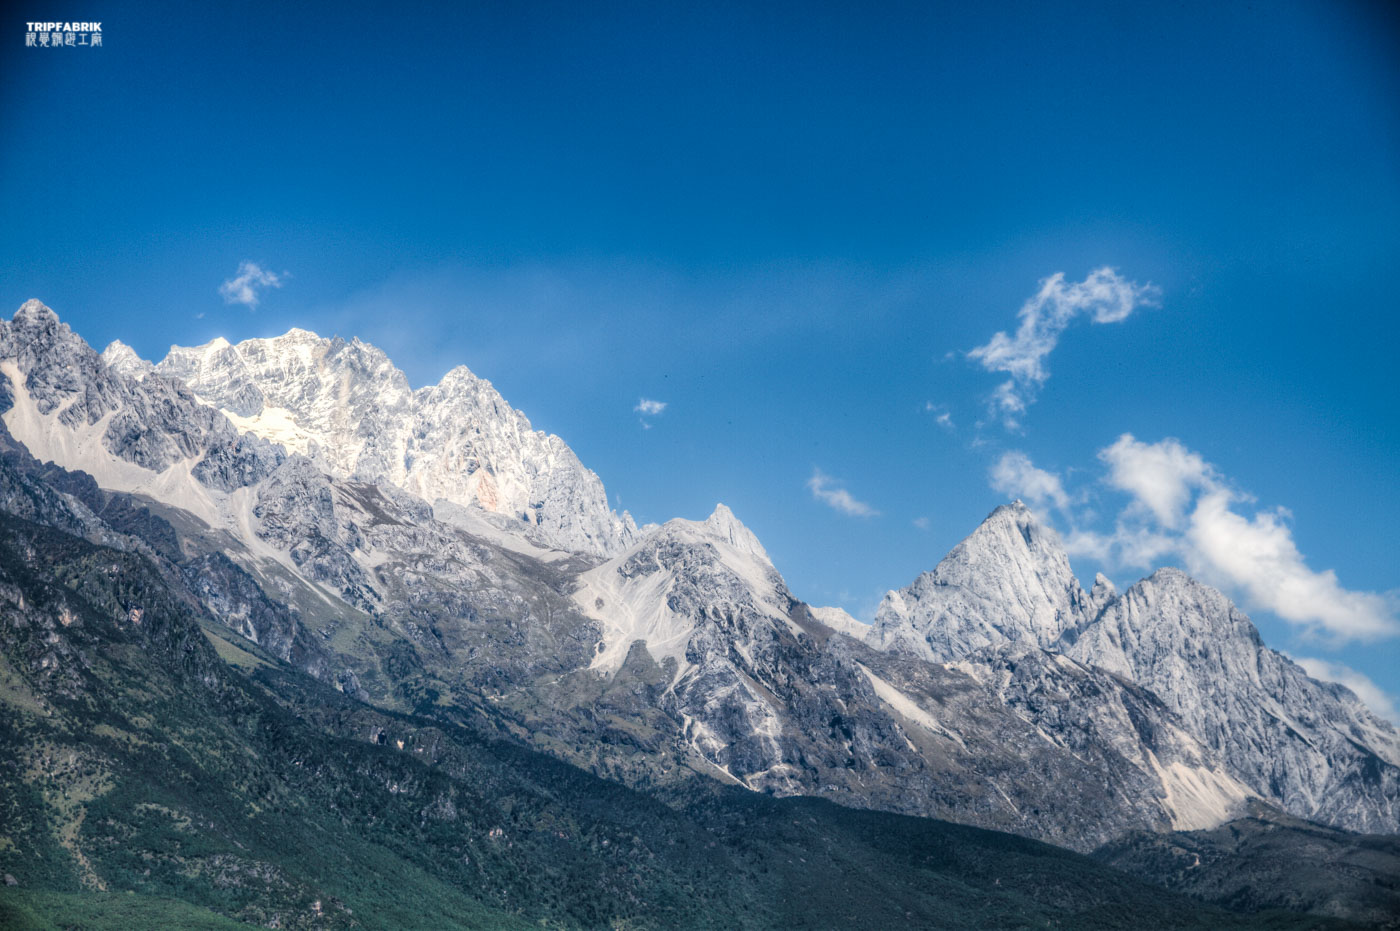 Lijiang Yunnan China | Tripfabrik | creative digital agency